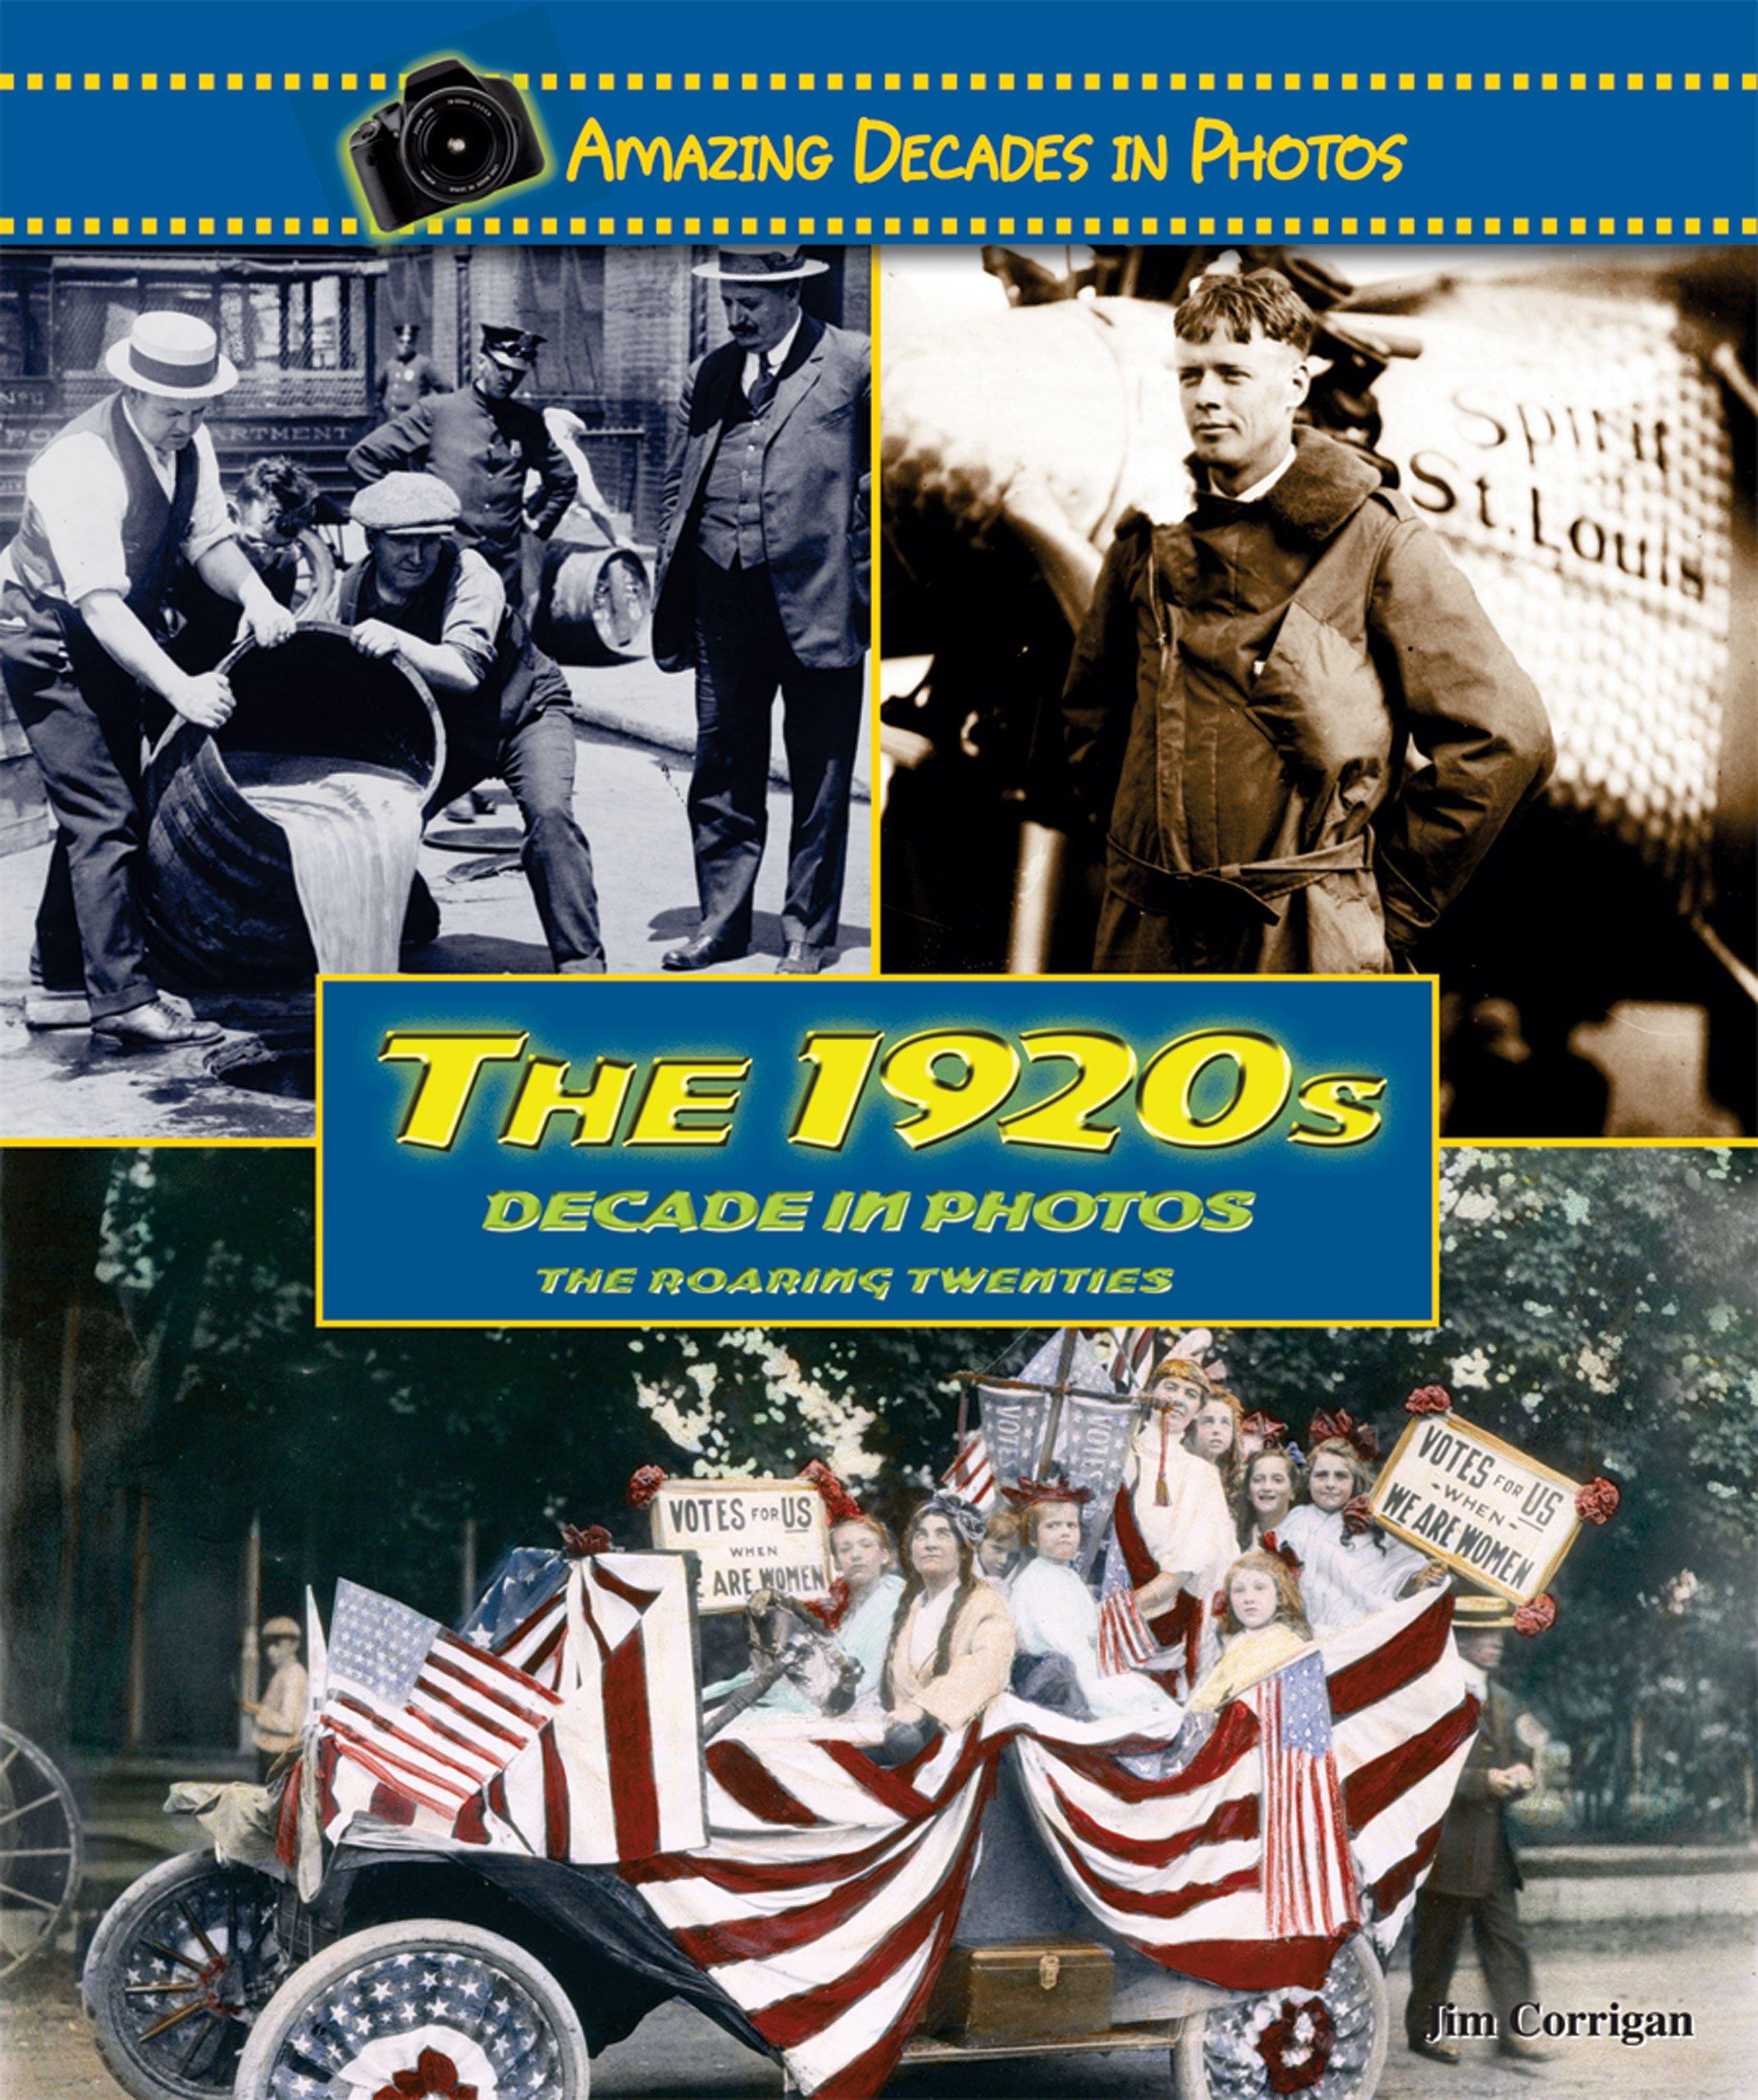 The 1920s Decade in Photos: The Roaring Twenties (Amazing Decades in Photos)